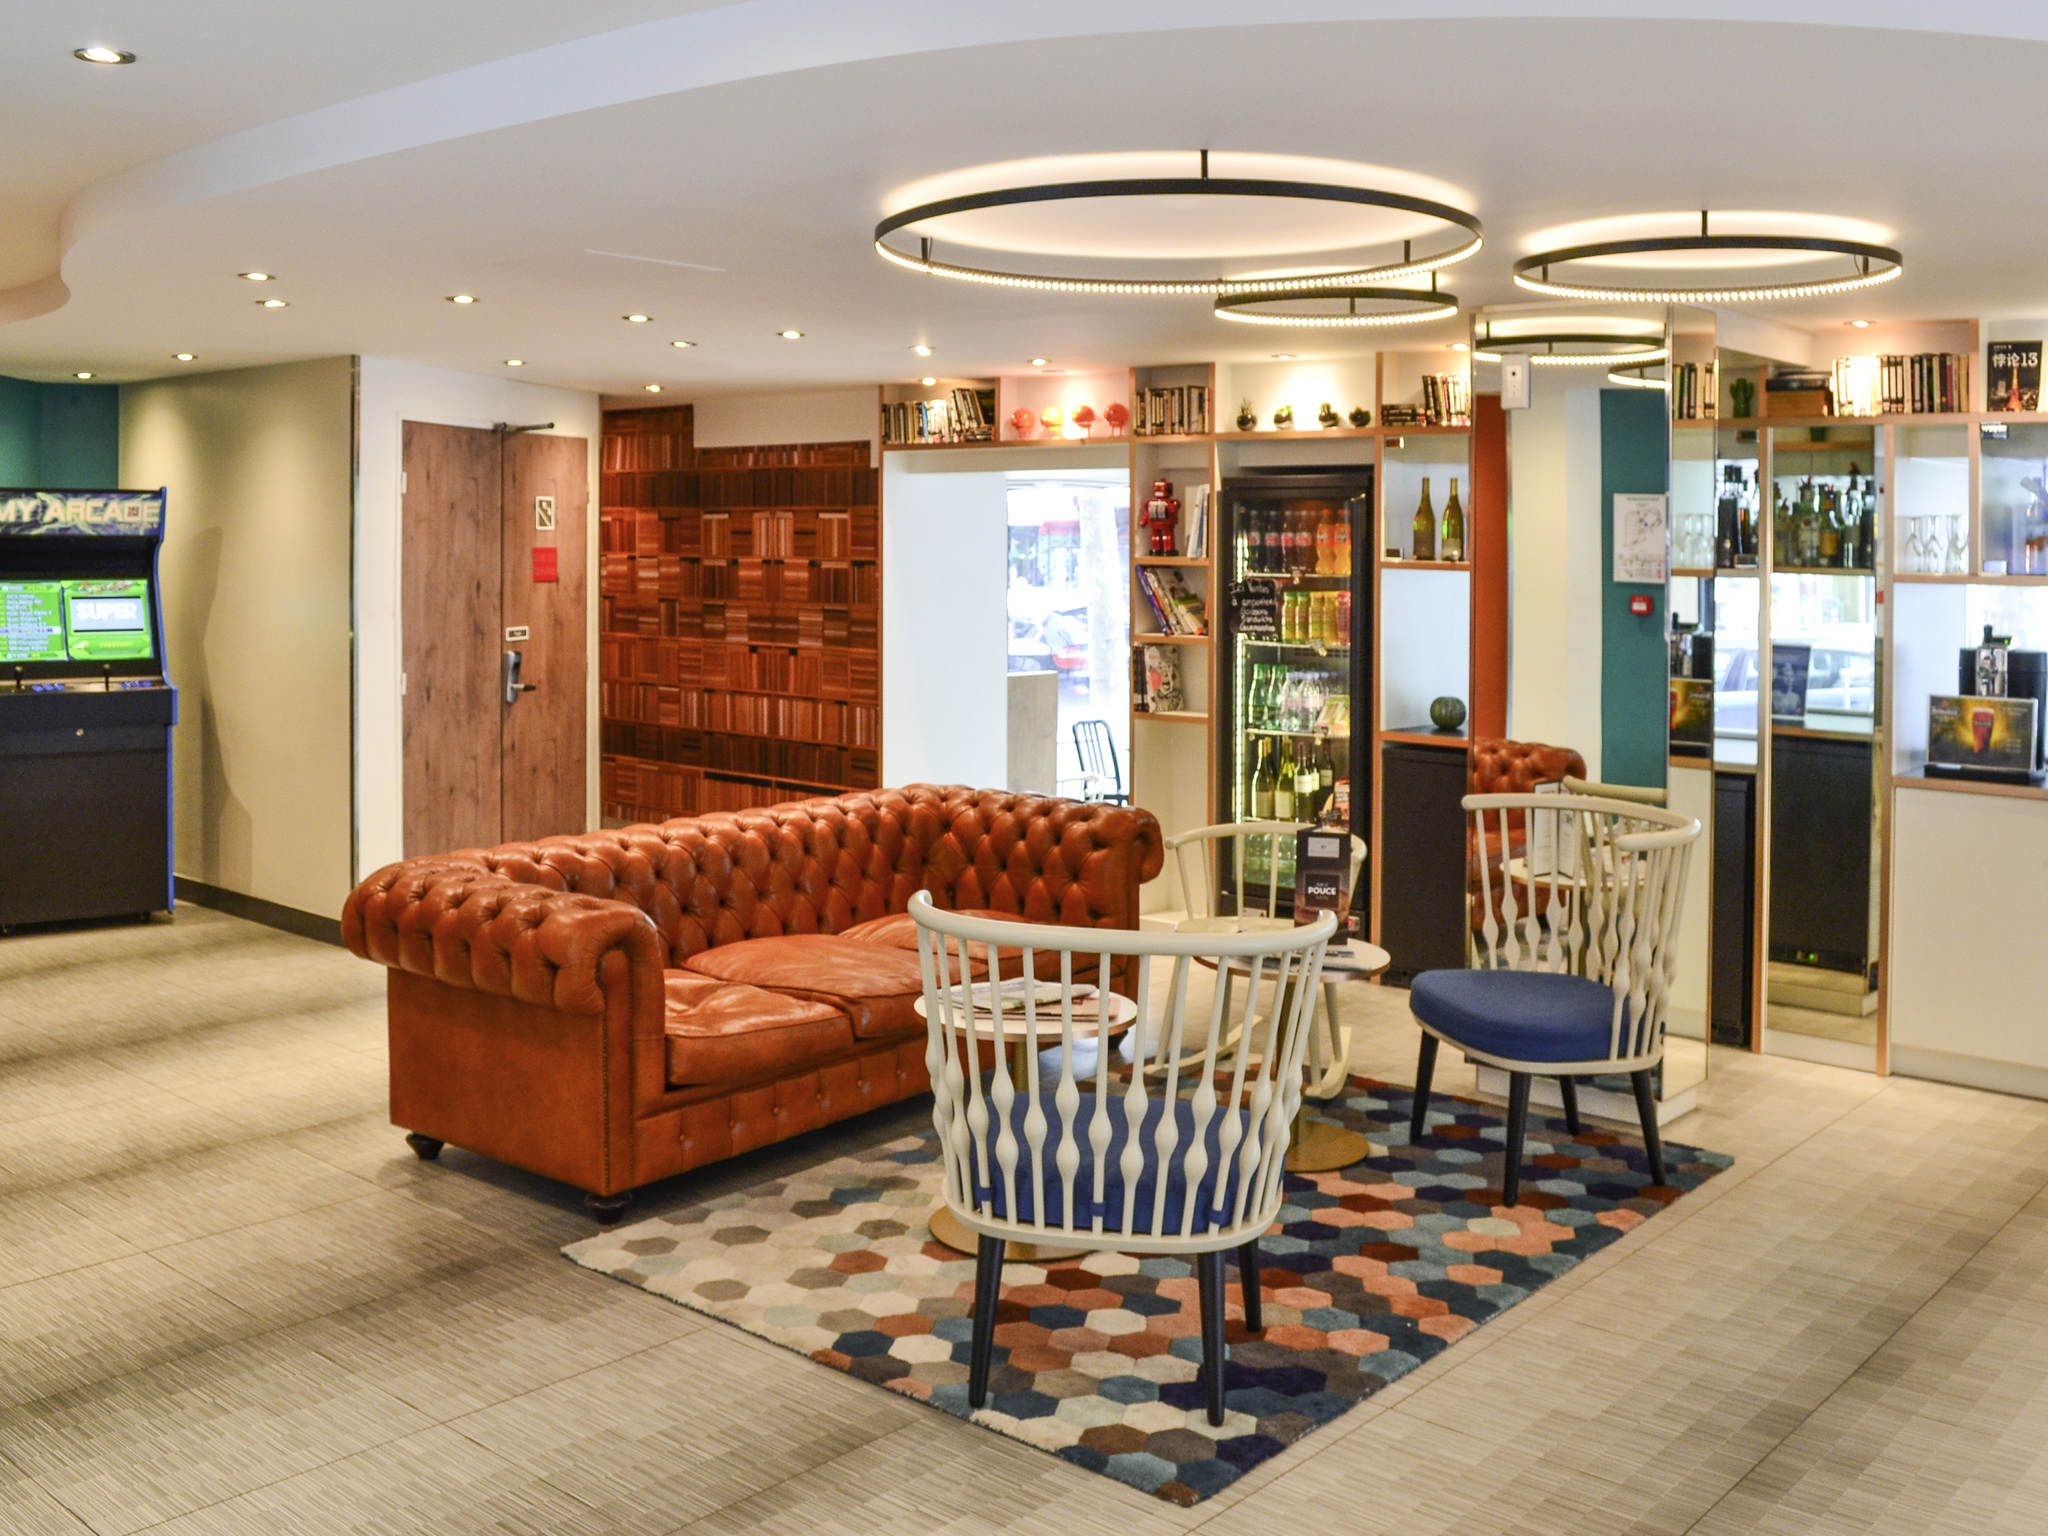 Hotel - ibis Paris Gare de Lyon Diderot 12th